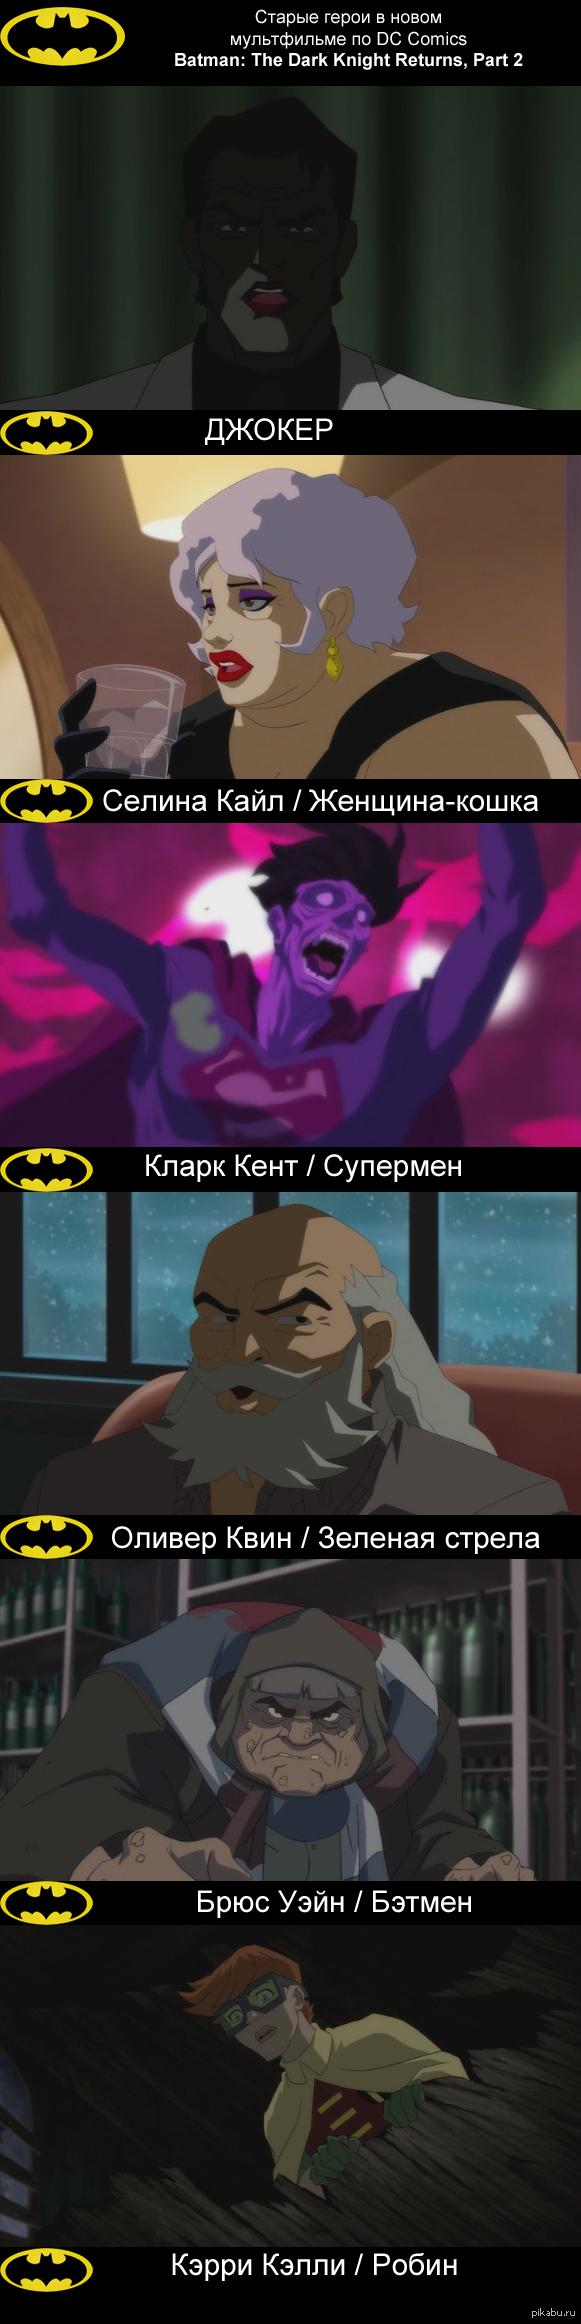 Мультфильм про бэтмена порвал мне